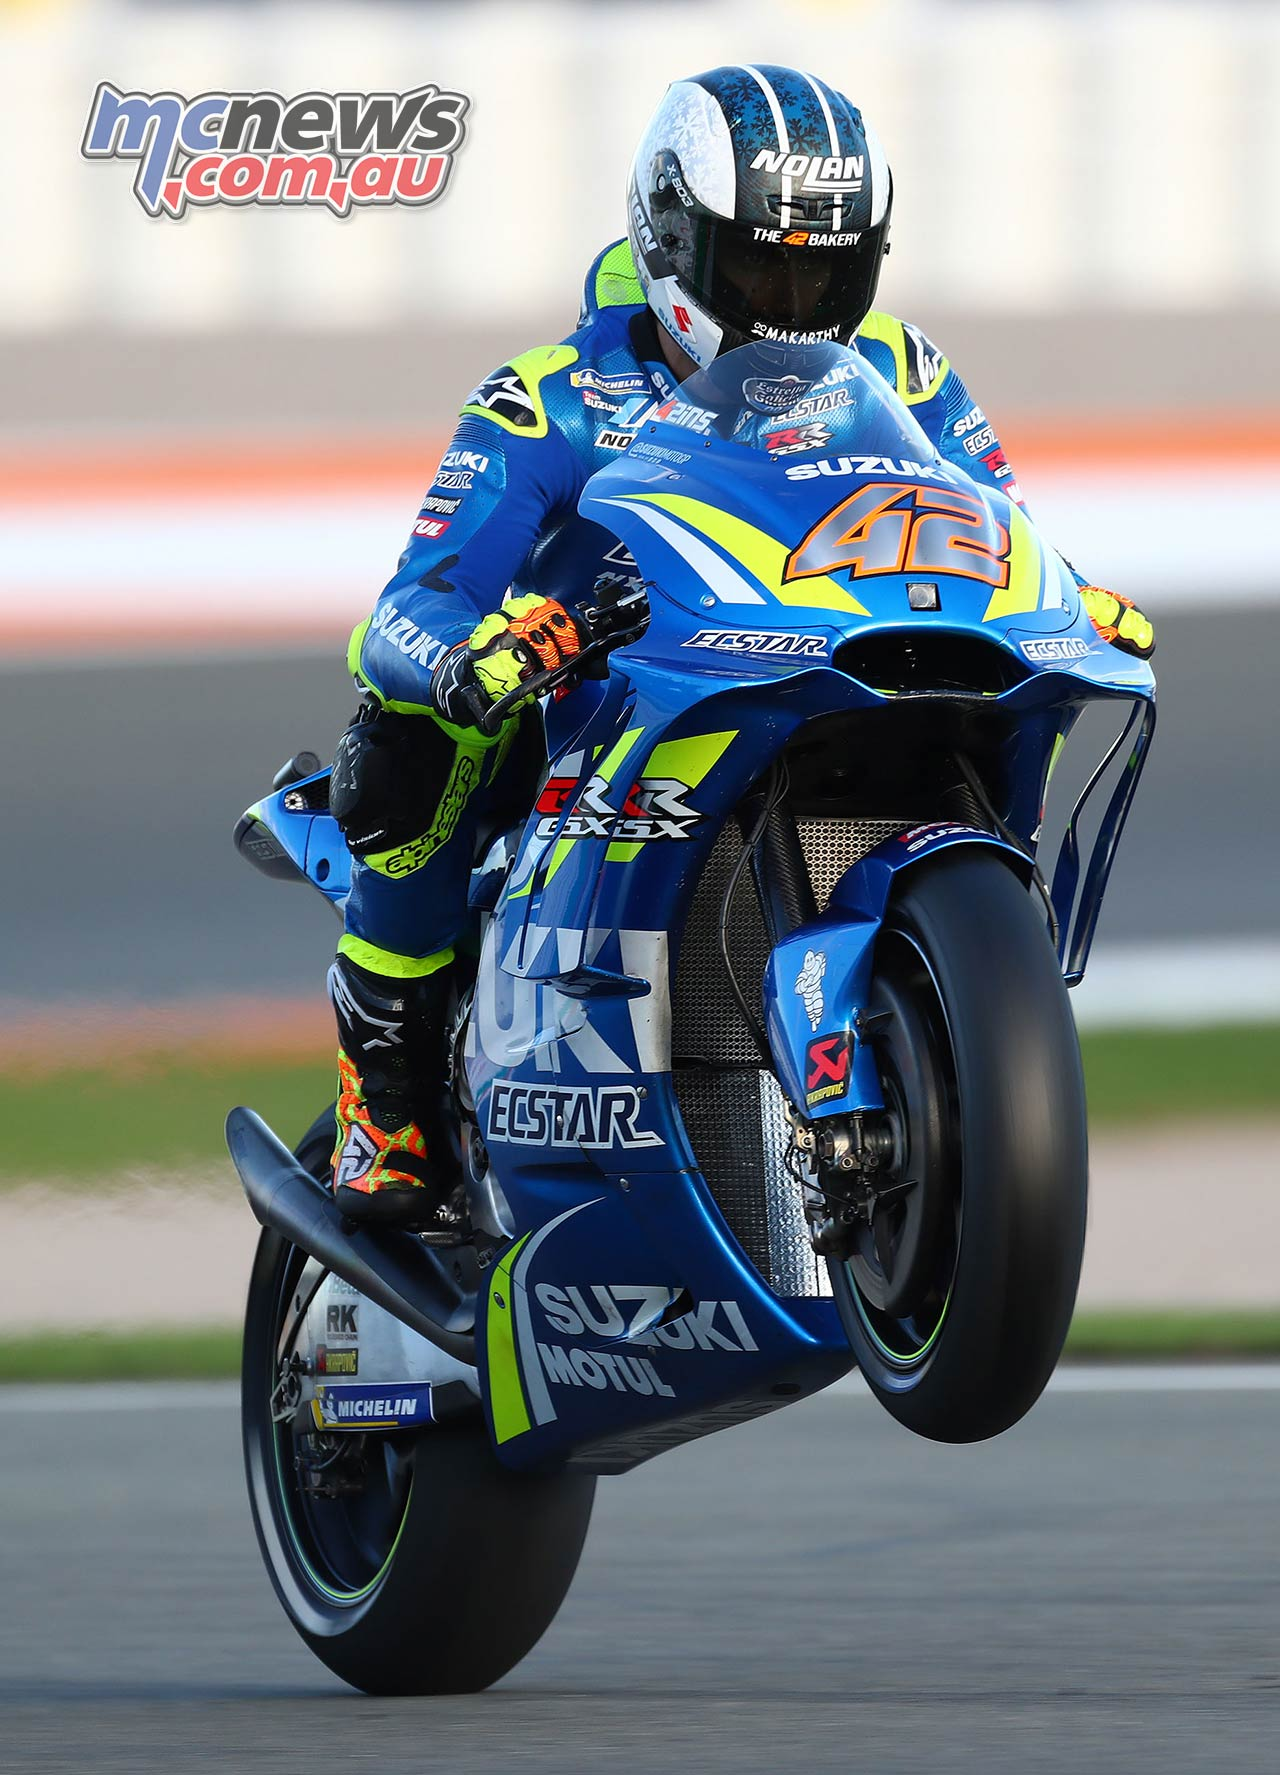 Valencia MotoGP 2019 Test Images   Gallery D   MCNews.com.au